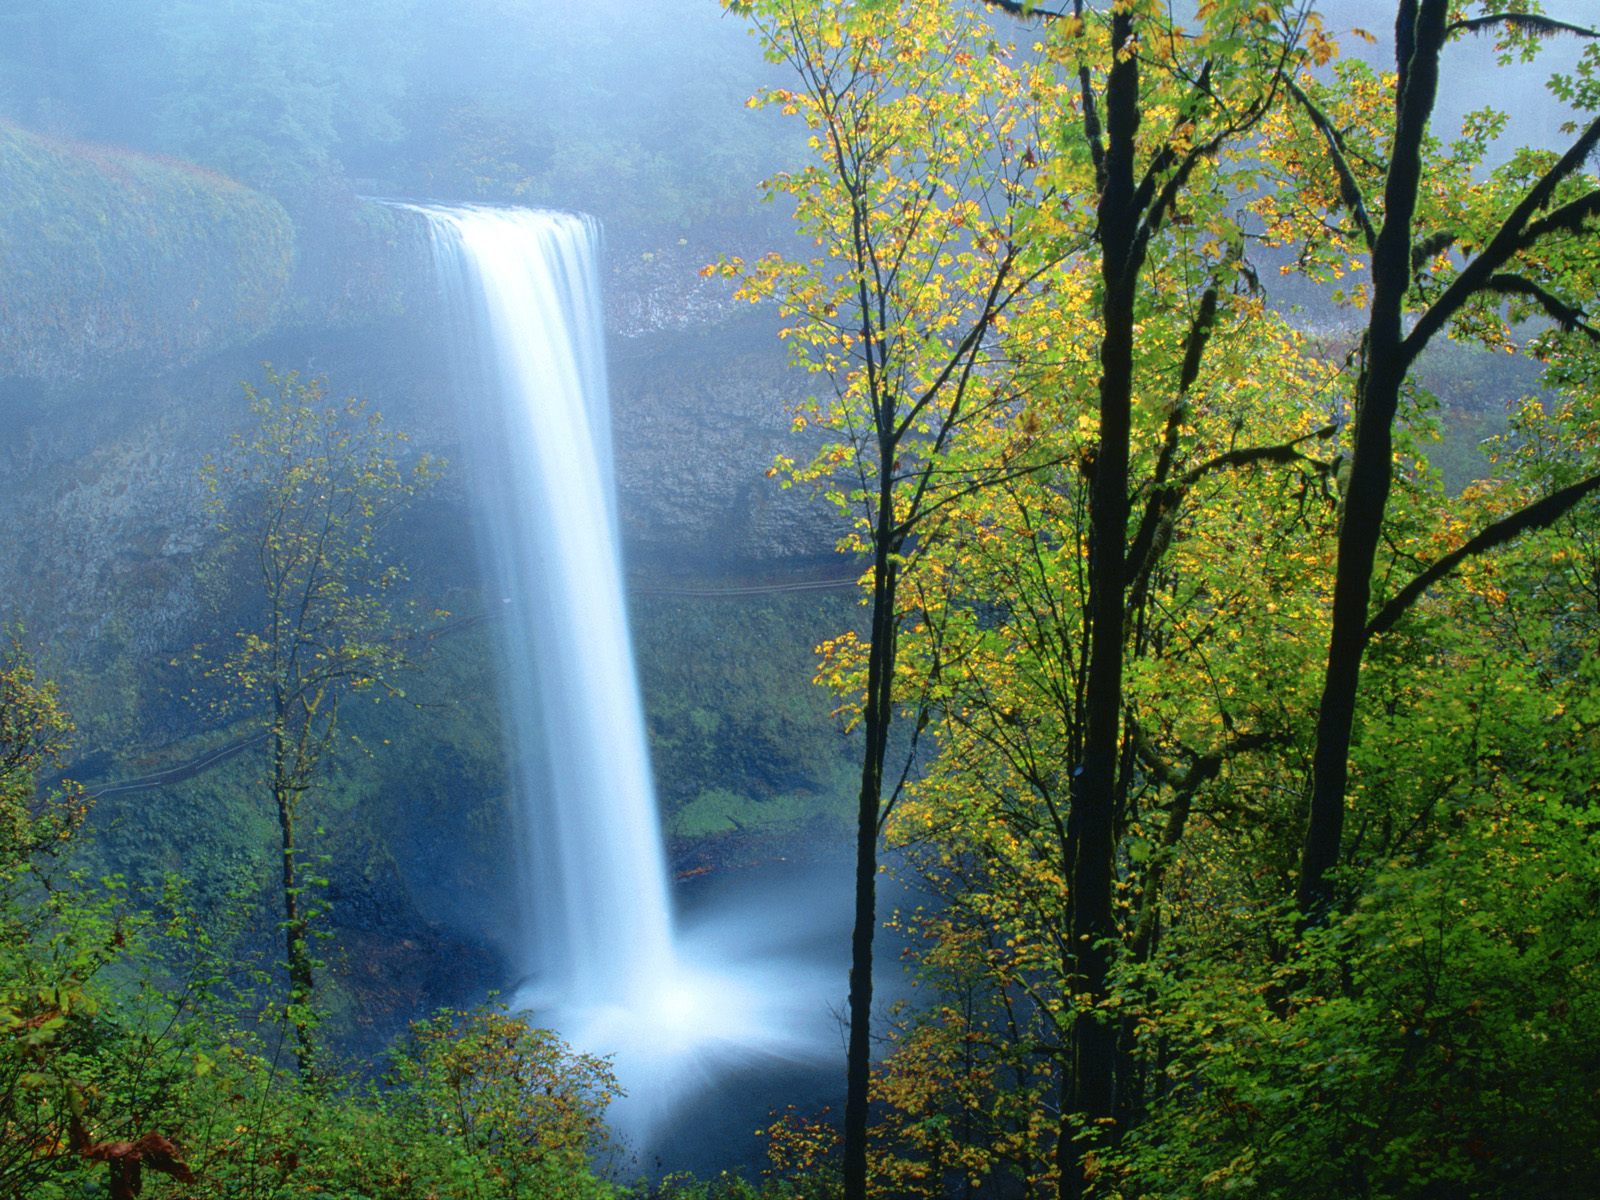 South falls silver falls state park oregon waterfalls - Oregon nature wallpaper ...